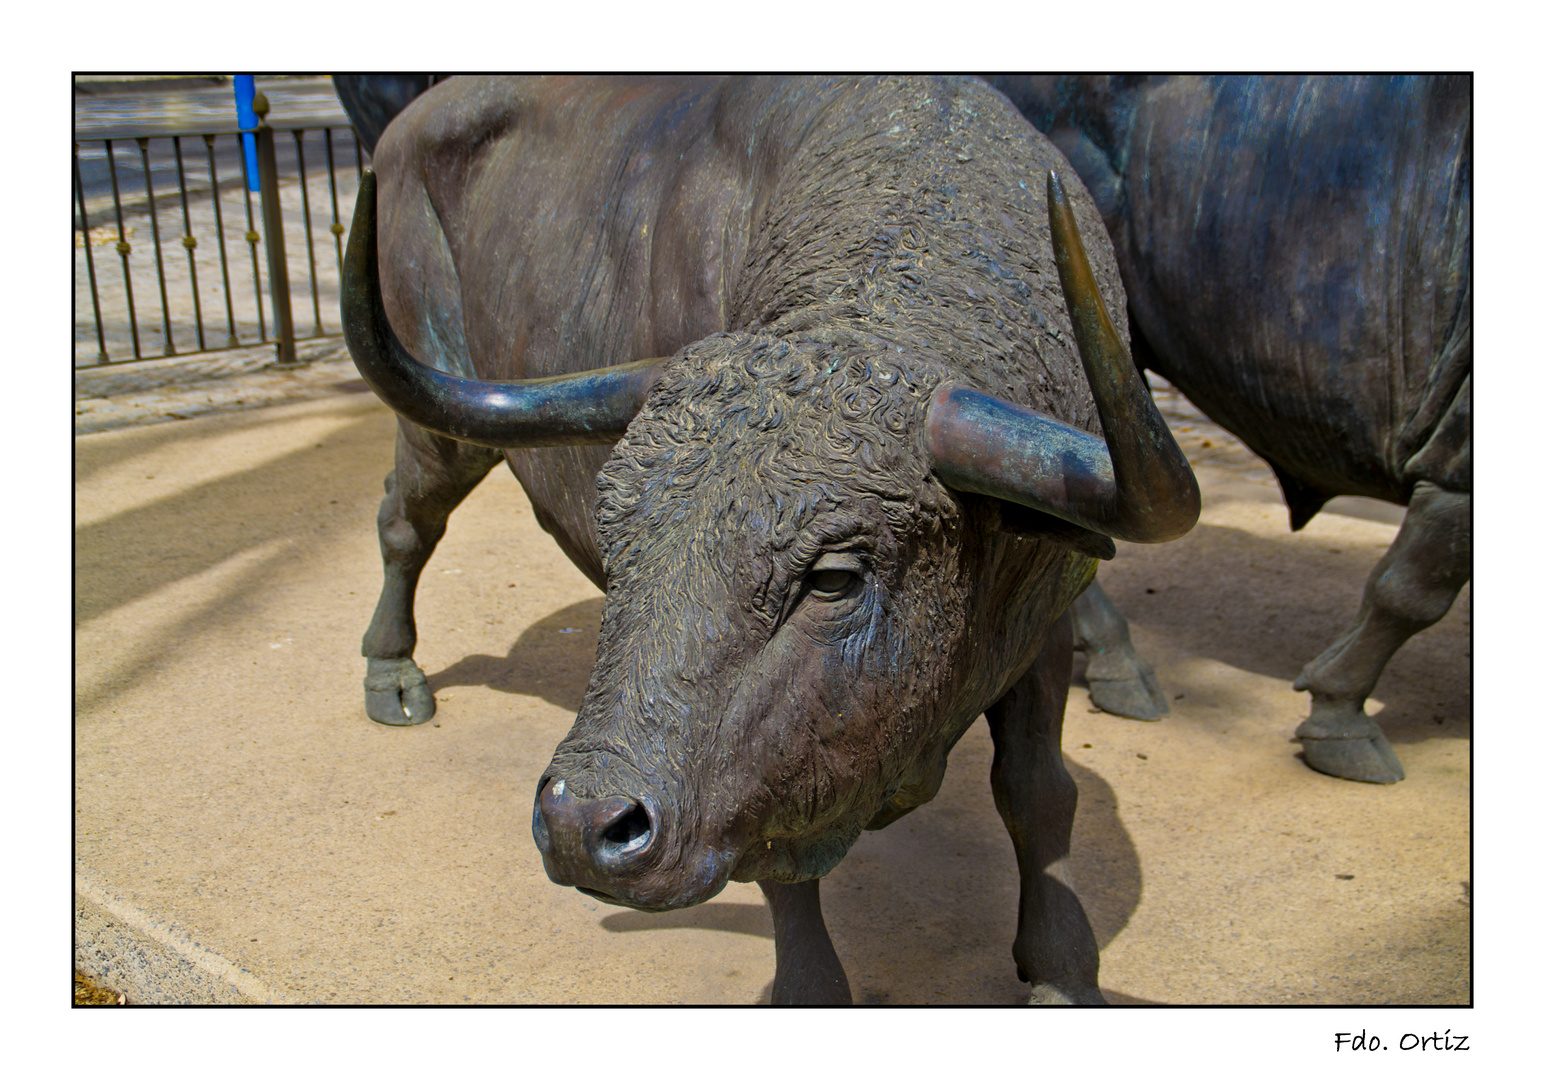 ¡¡Ese Toro!!